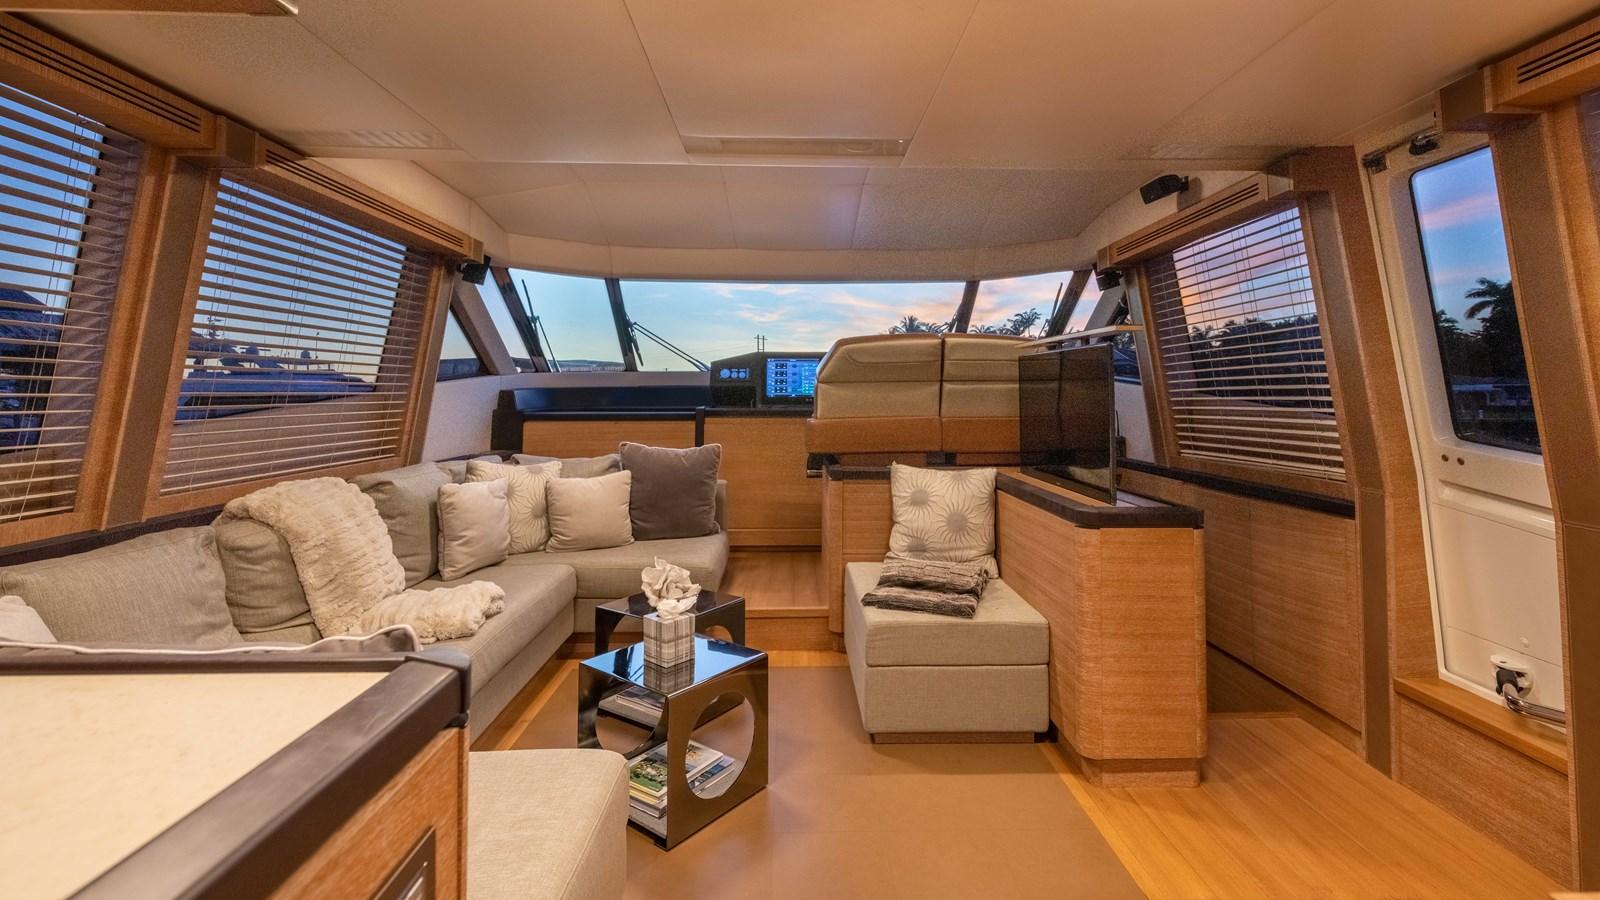 76 Monte Carlo (112 of 127) 2014 MONTE CARLO YACHTS Motoryacht Motor Yacht 2825127